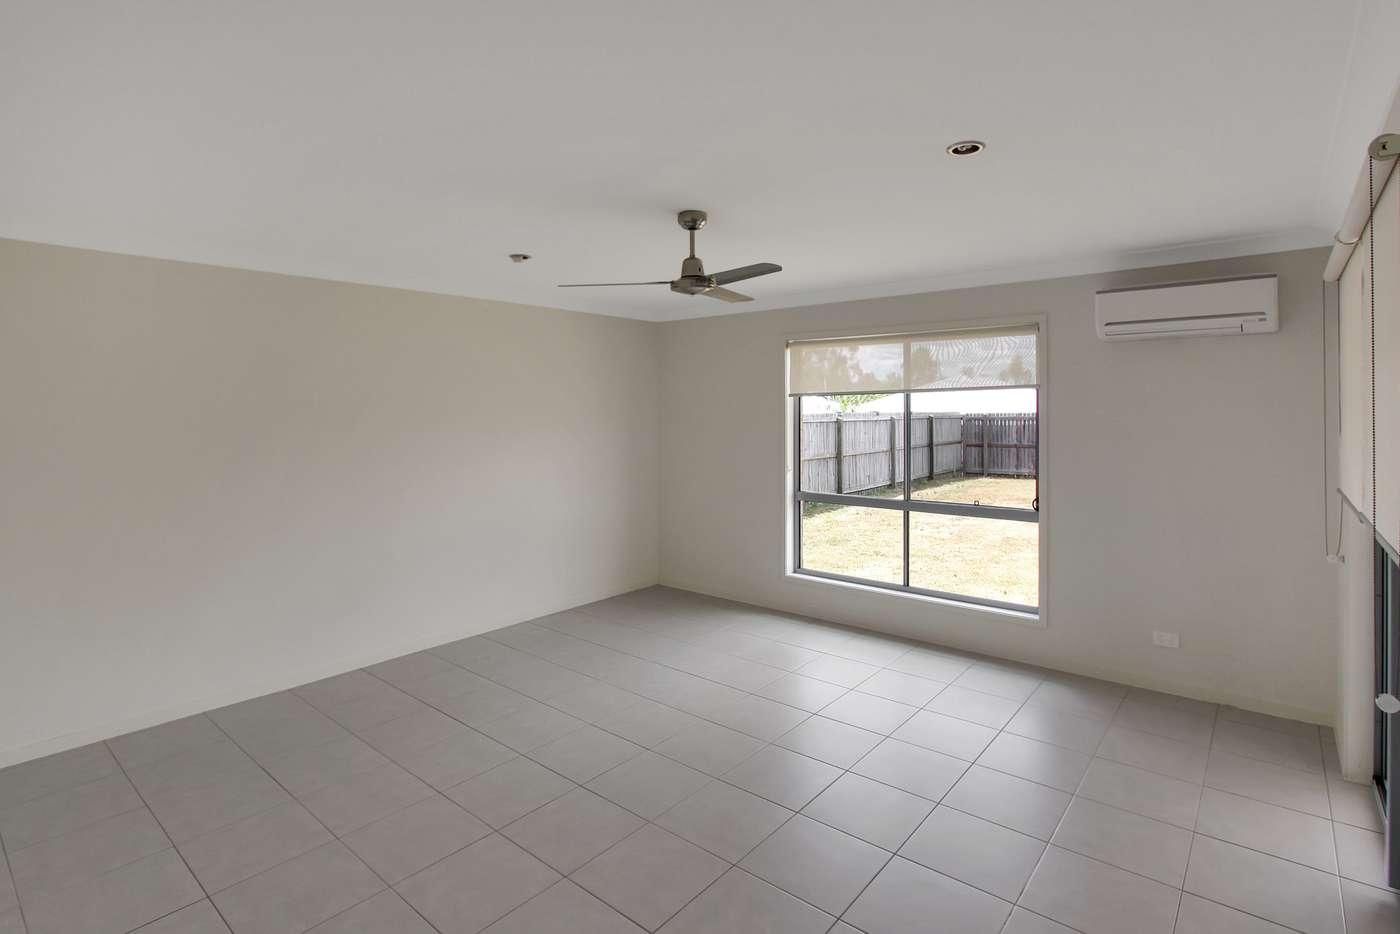 Sixth view of Homely house listing, 11 Bernard Circuit, Yarrabilba QLD 4207